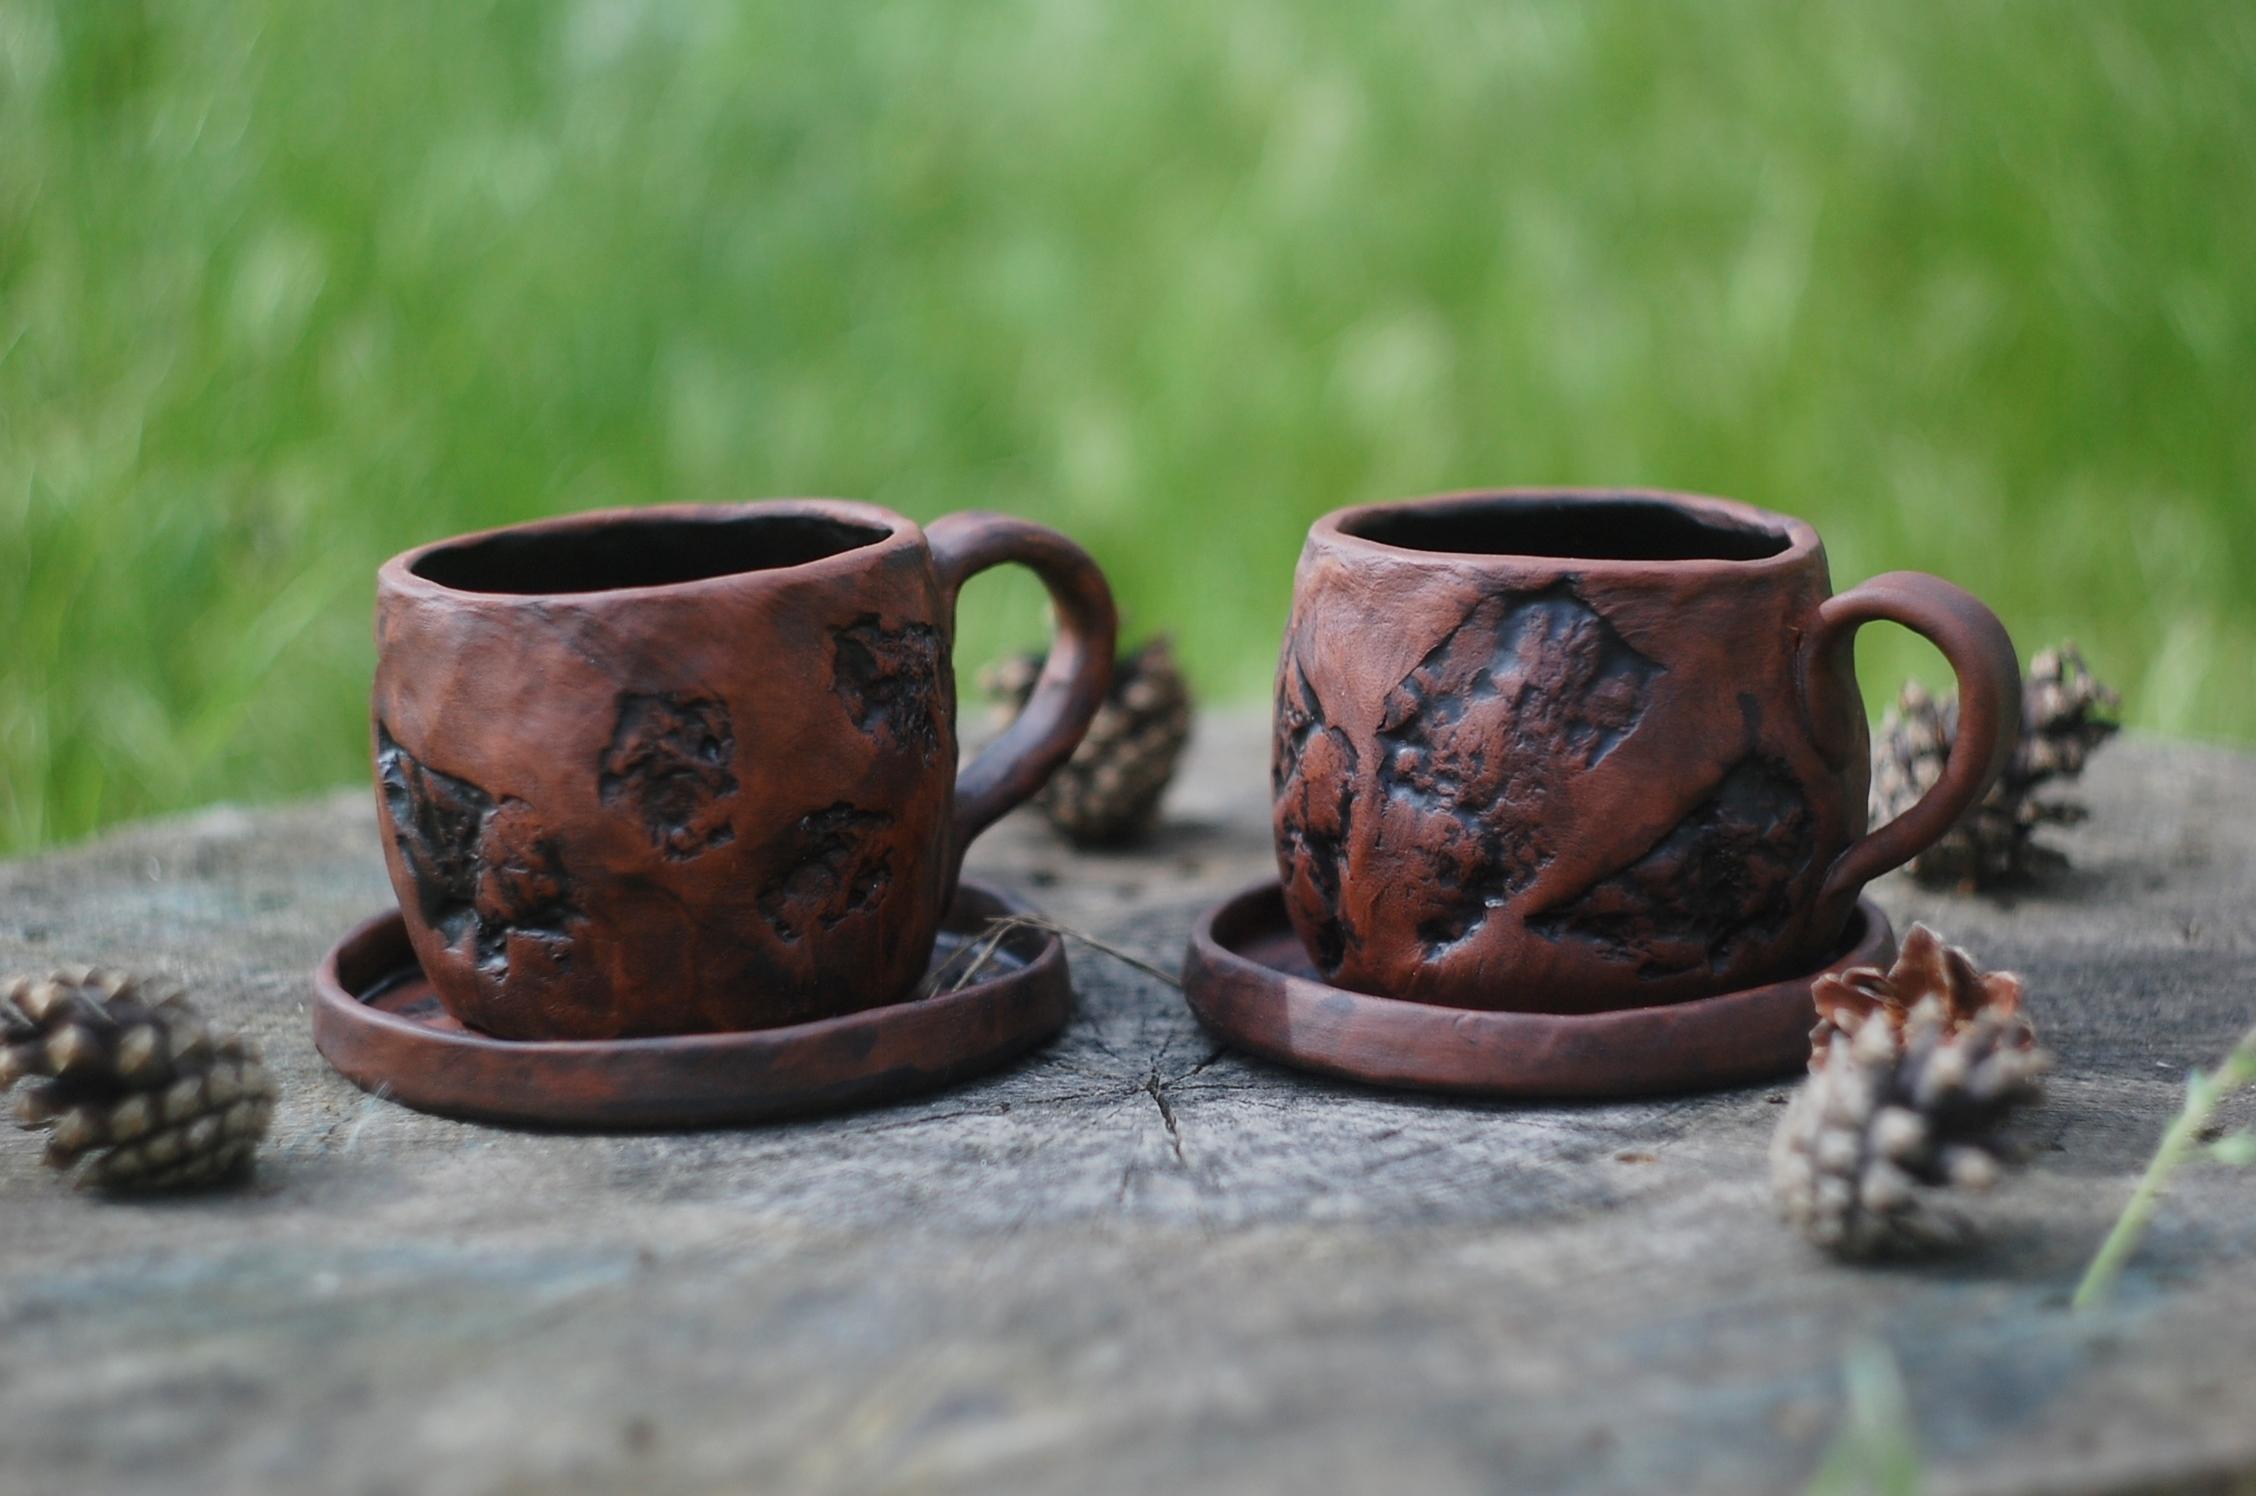 Handmade pottery ceramic mug with handle Stones art handmade pottery mug ~9oz